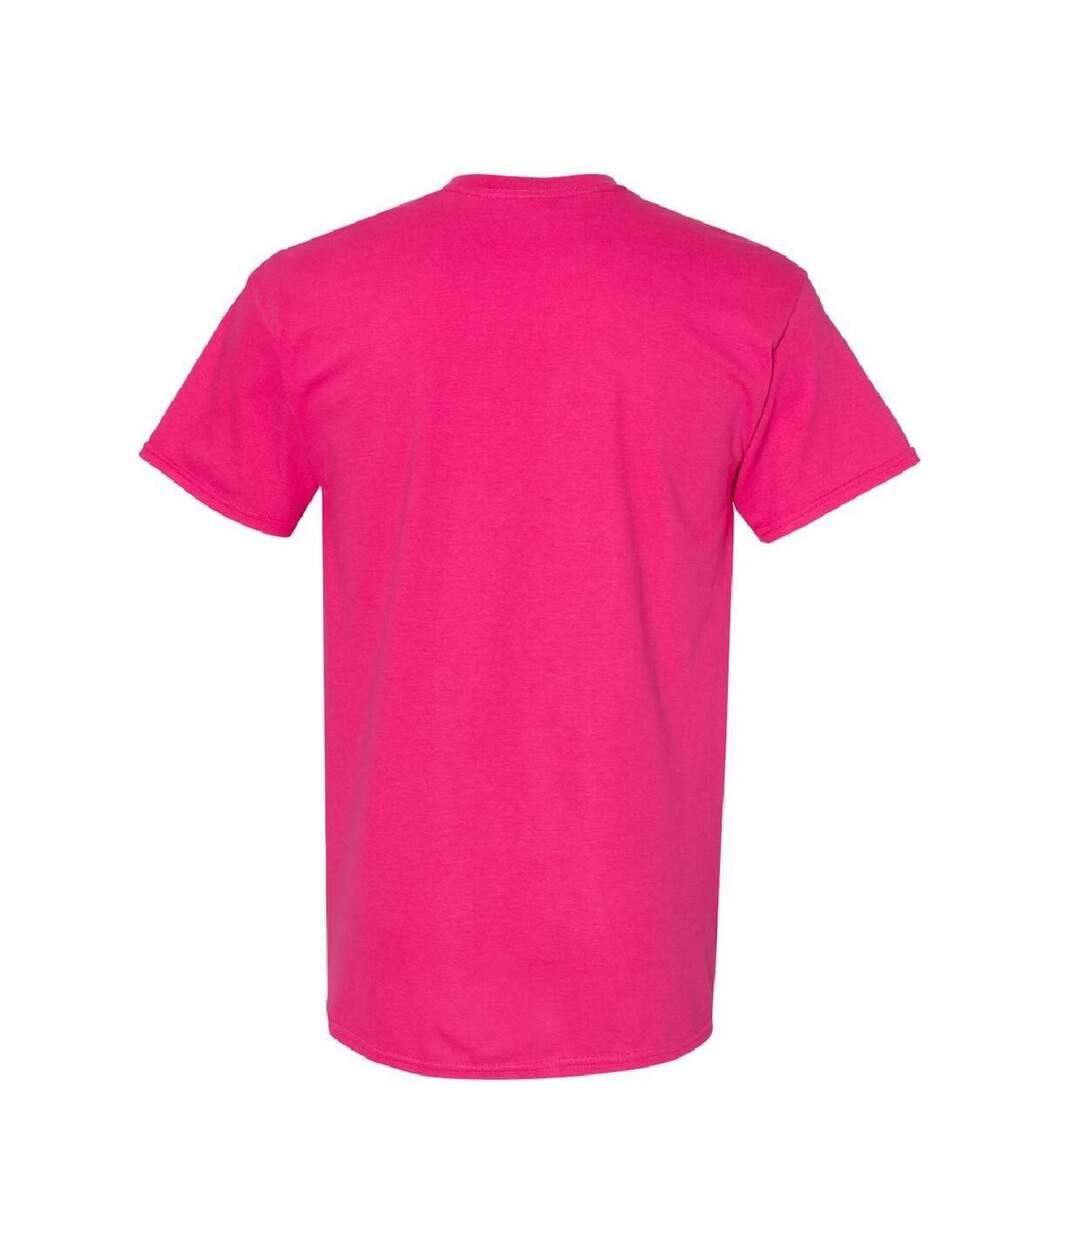 Gildan Mens Heavy Cotton Short Sleeve T-Shirt (Pack Of 5) (Heliconia) - UTBC4807